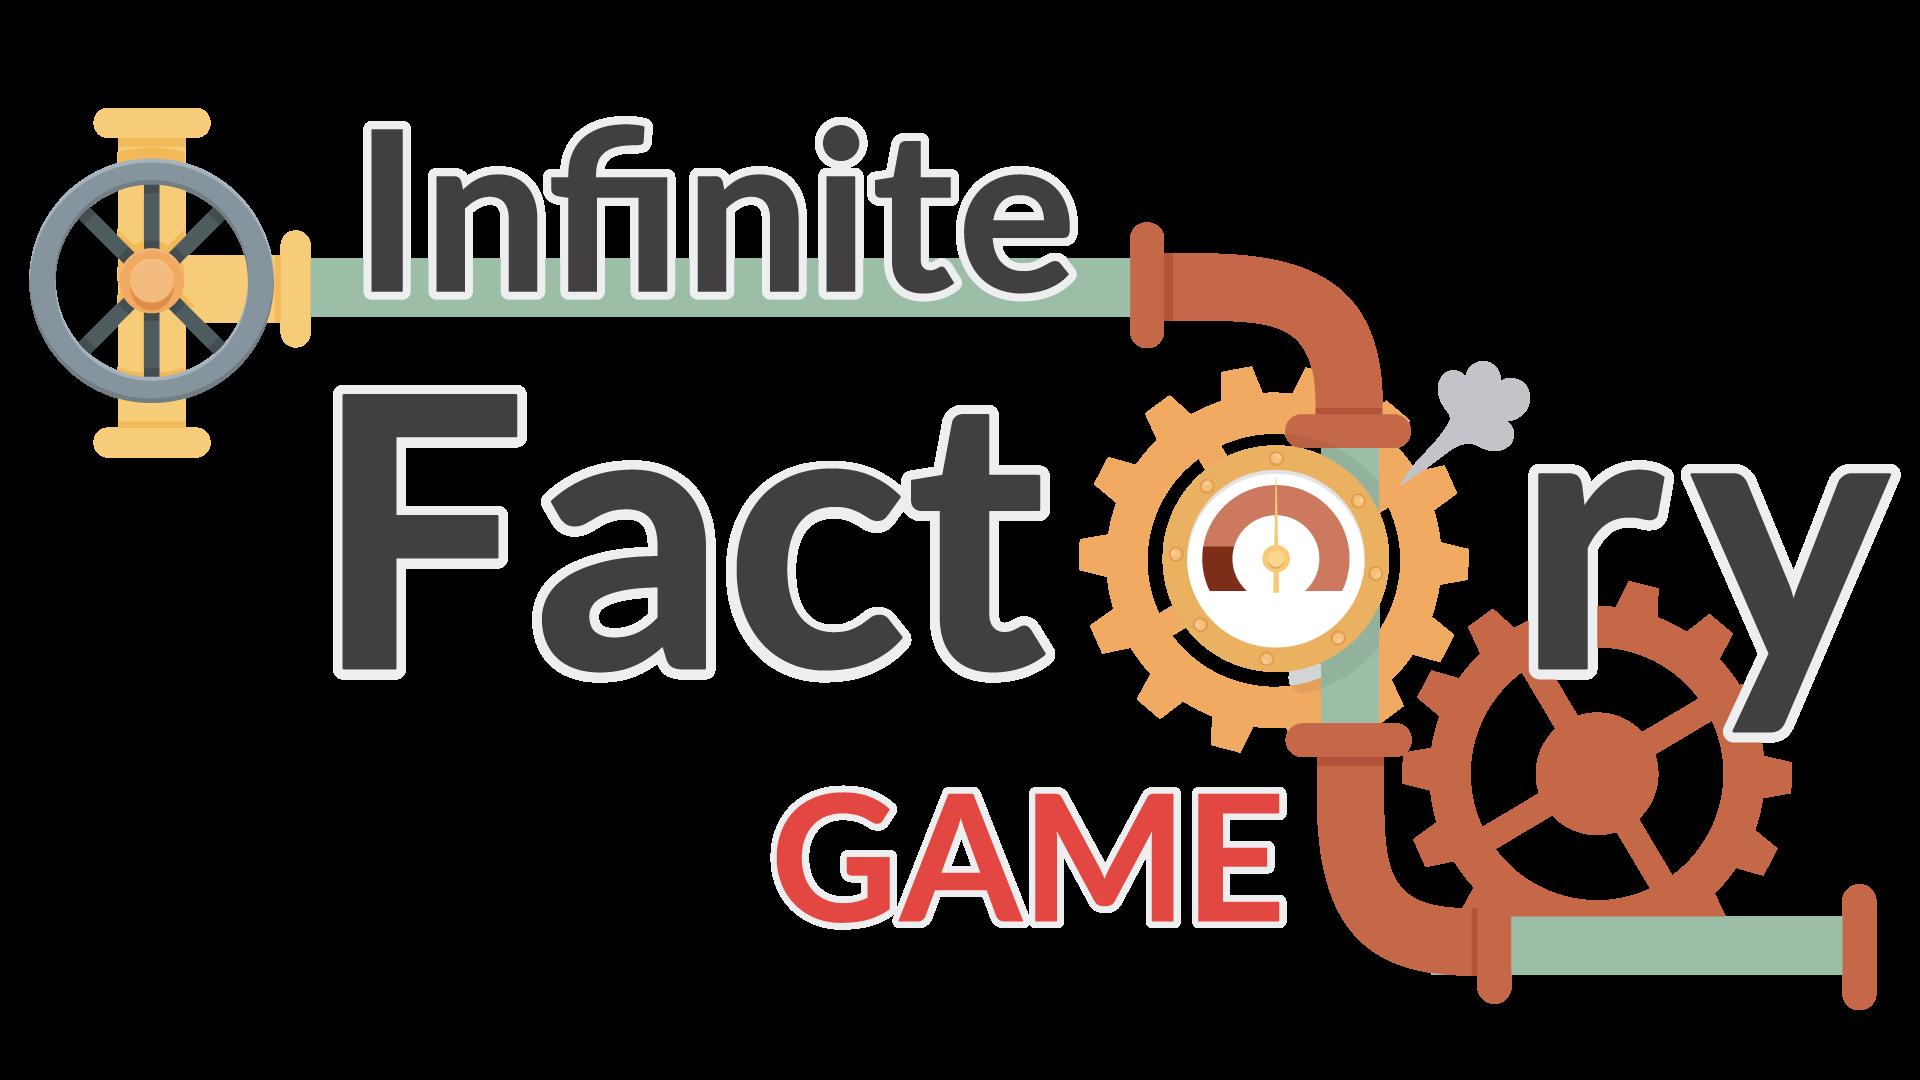 INFINITE FACTORY GAME